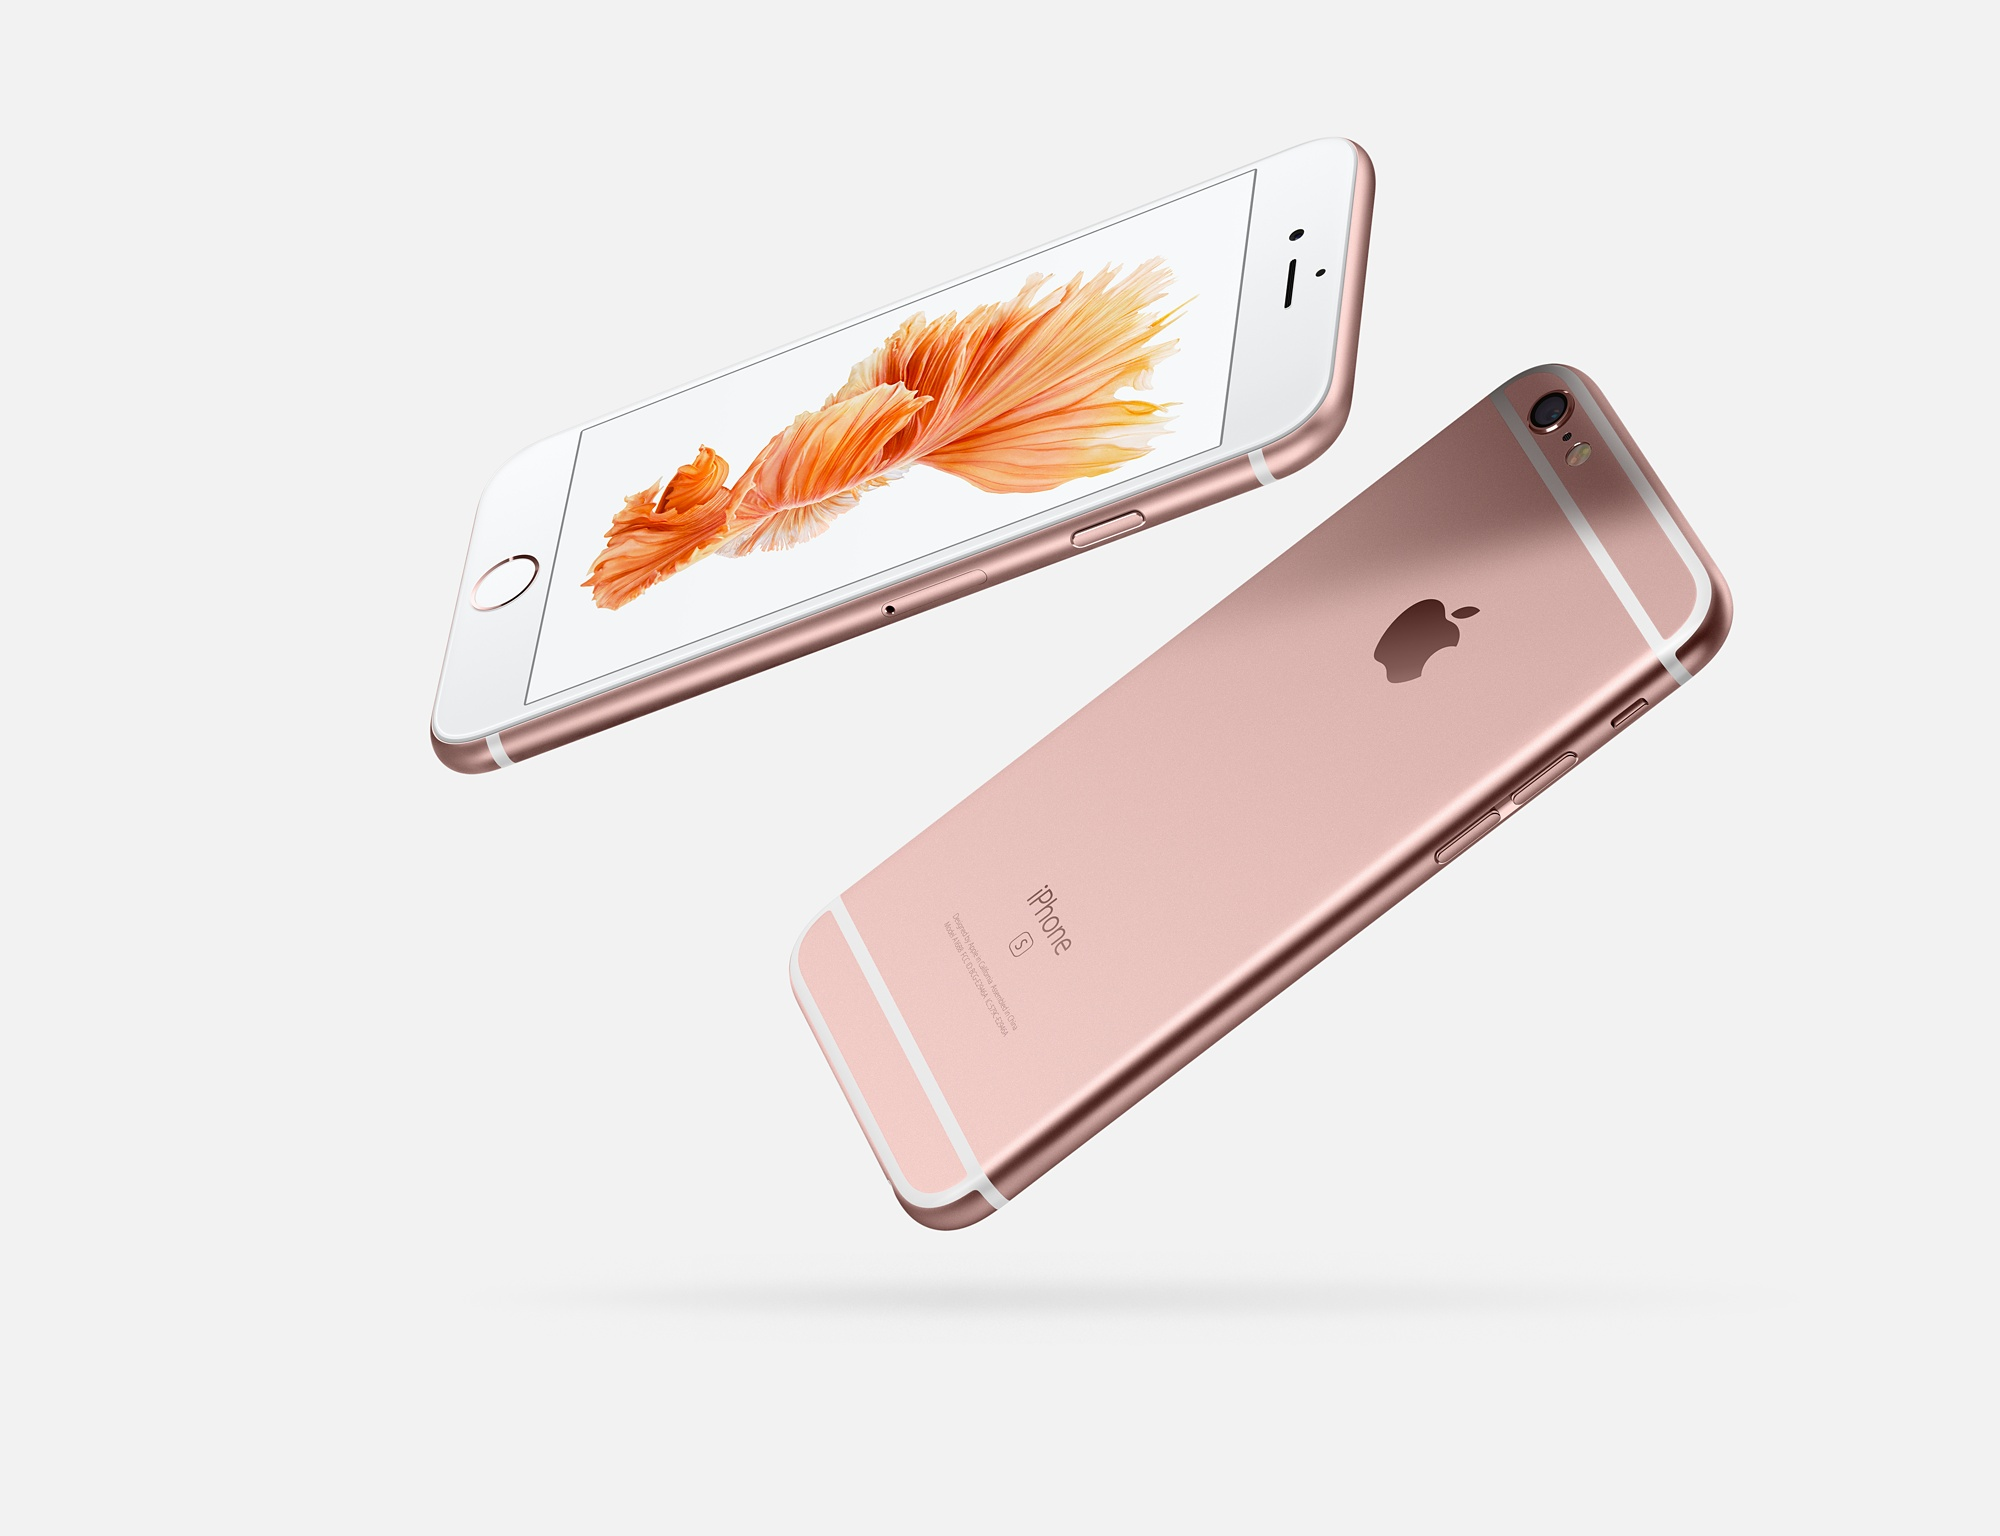 iphone6s-gallery1-2015-1